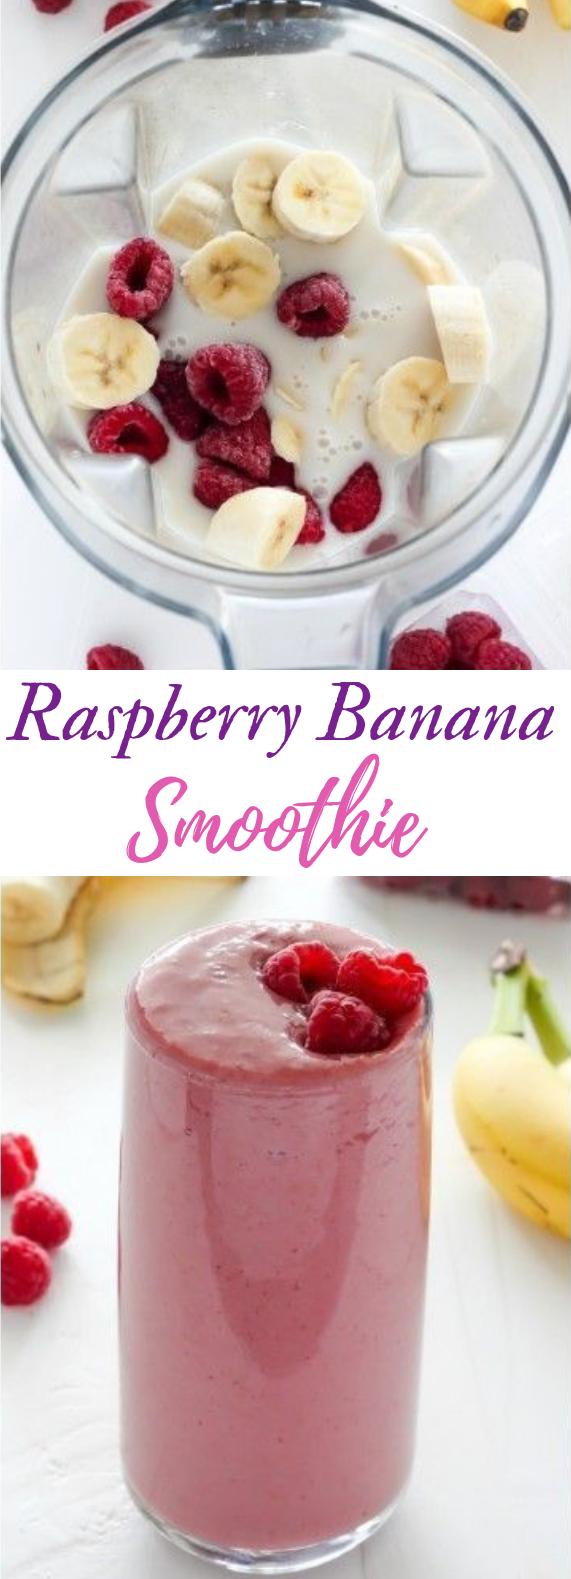 Raspberry Banana Smoothie #rasberry #drinksmoothie